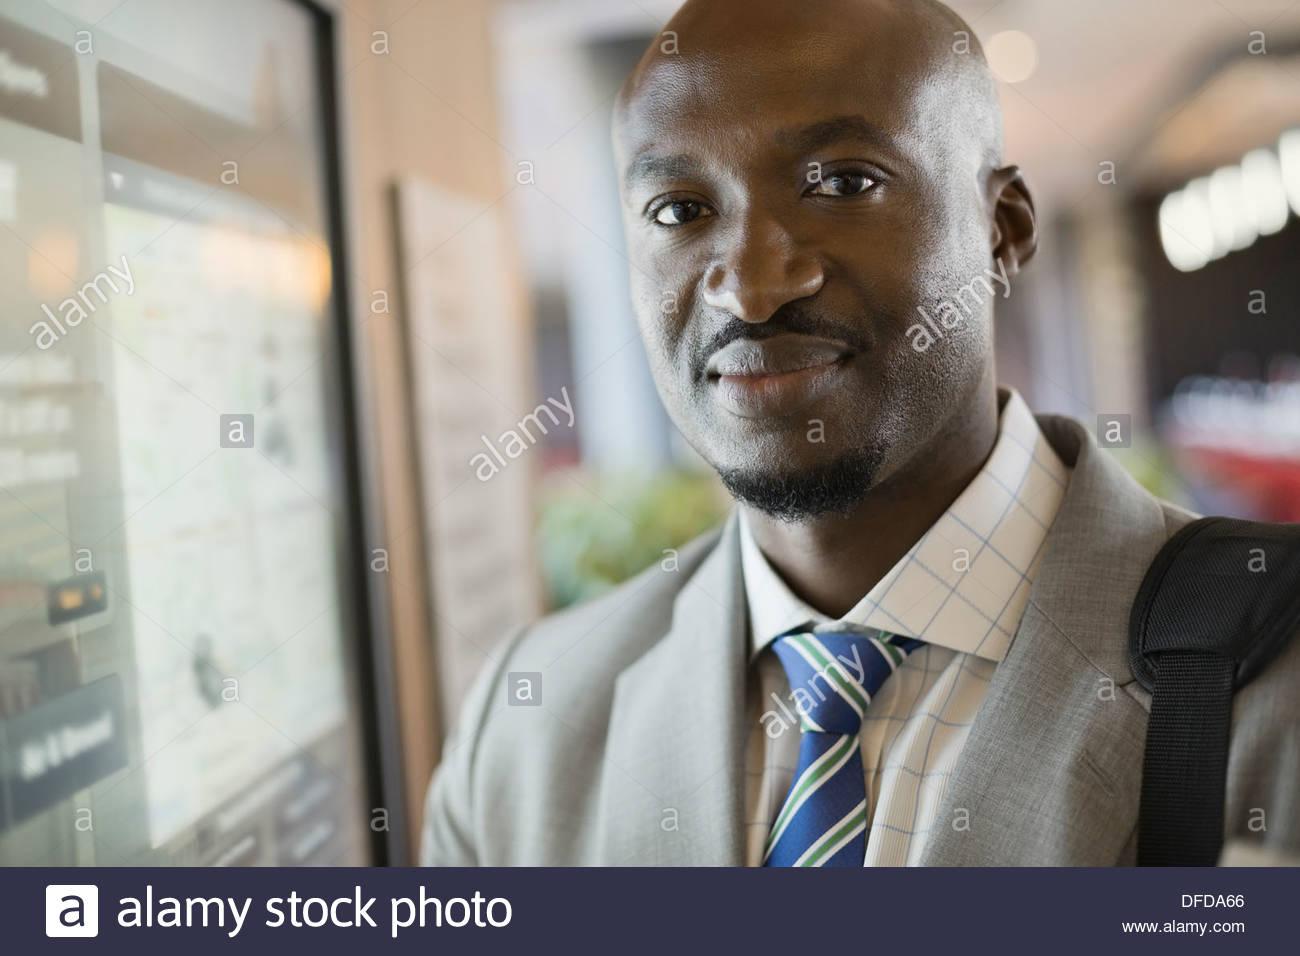 Close-up portrait of confident businessman at airport - Stock Image